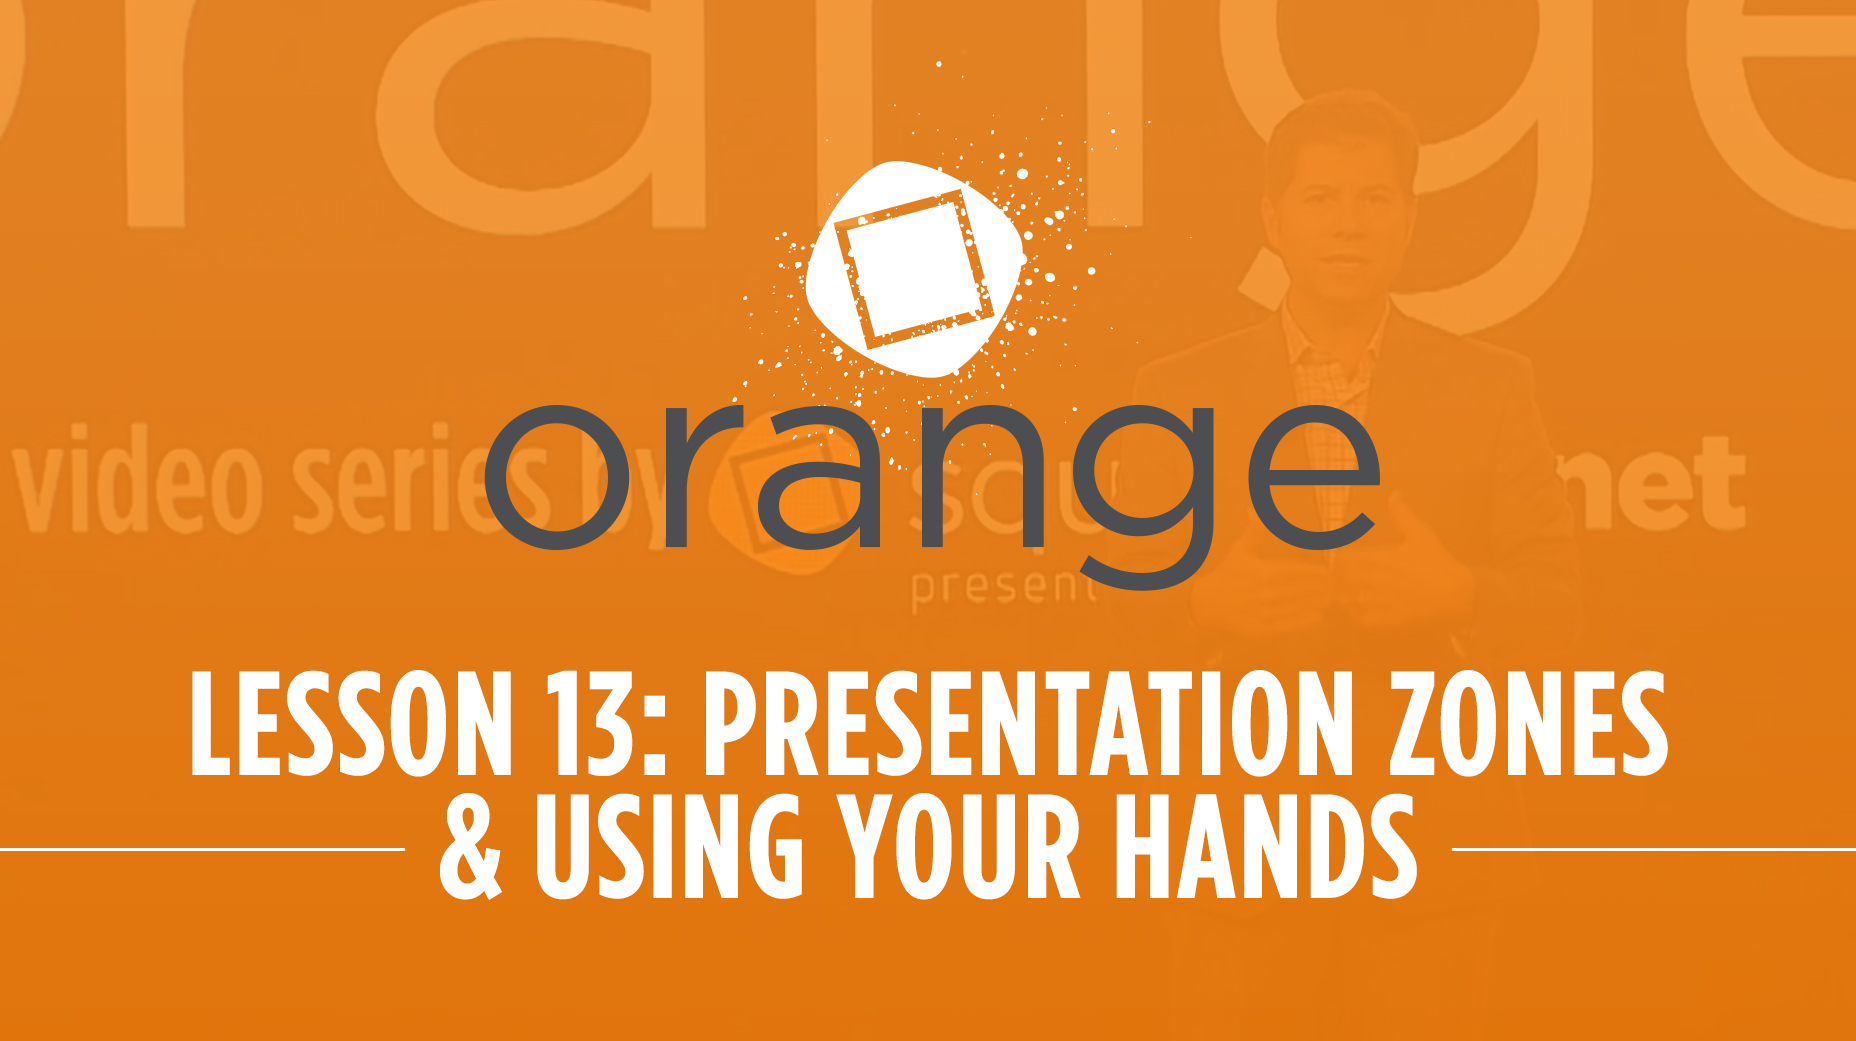 Orange – Lesson 13: Presentation Zones & Using Your Hands